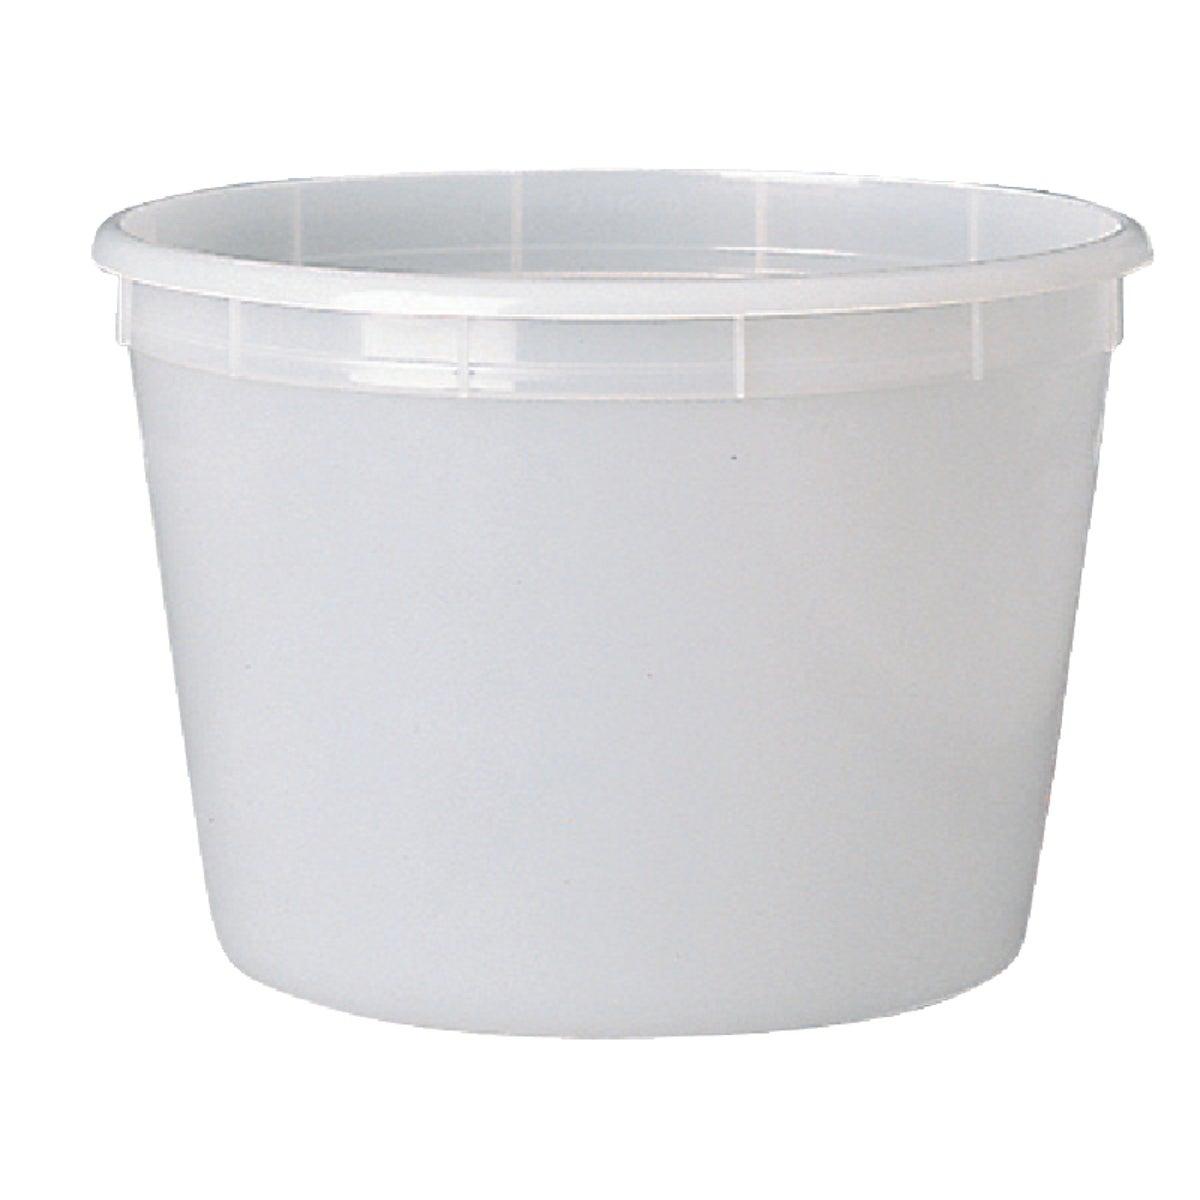 5PT PLASTIC UTILITY TUB